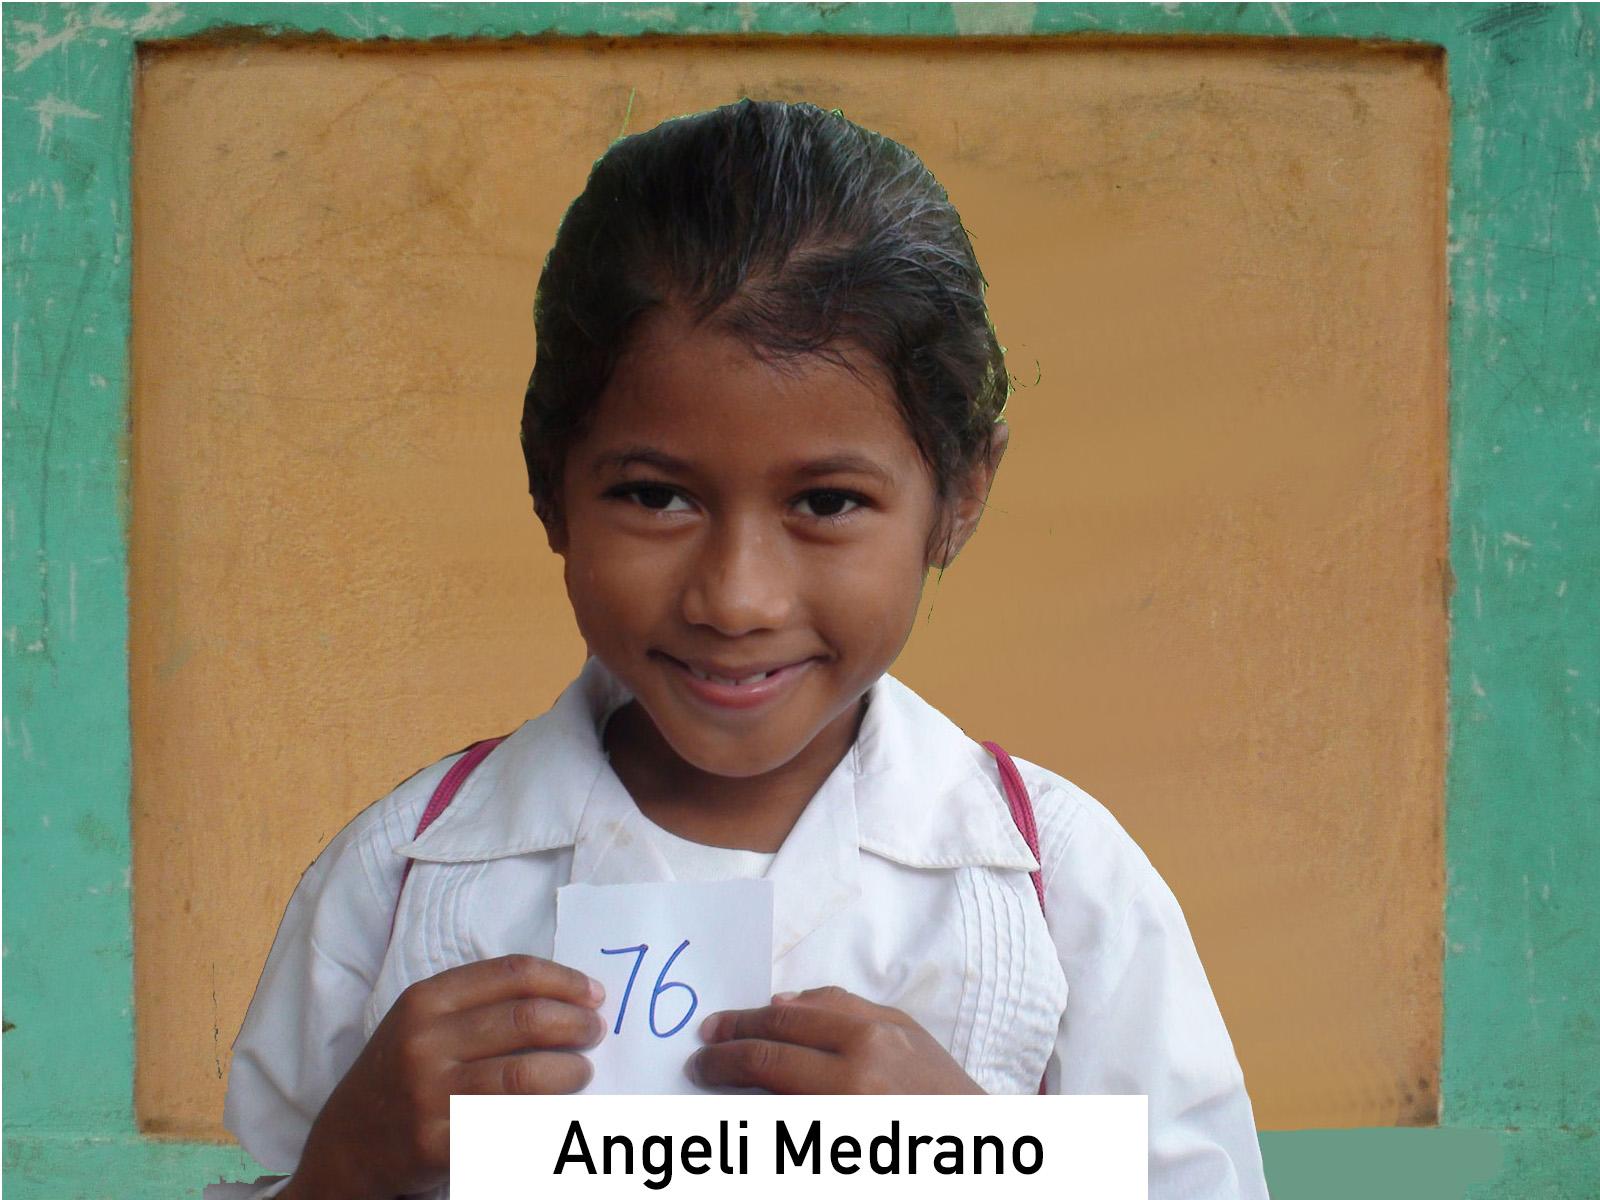 076 - Angeli Medrano.jpg